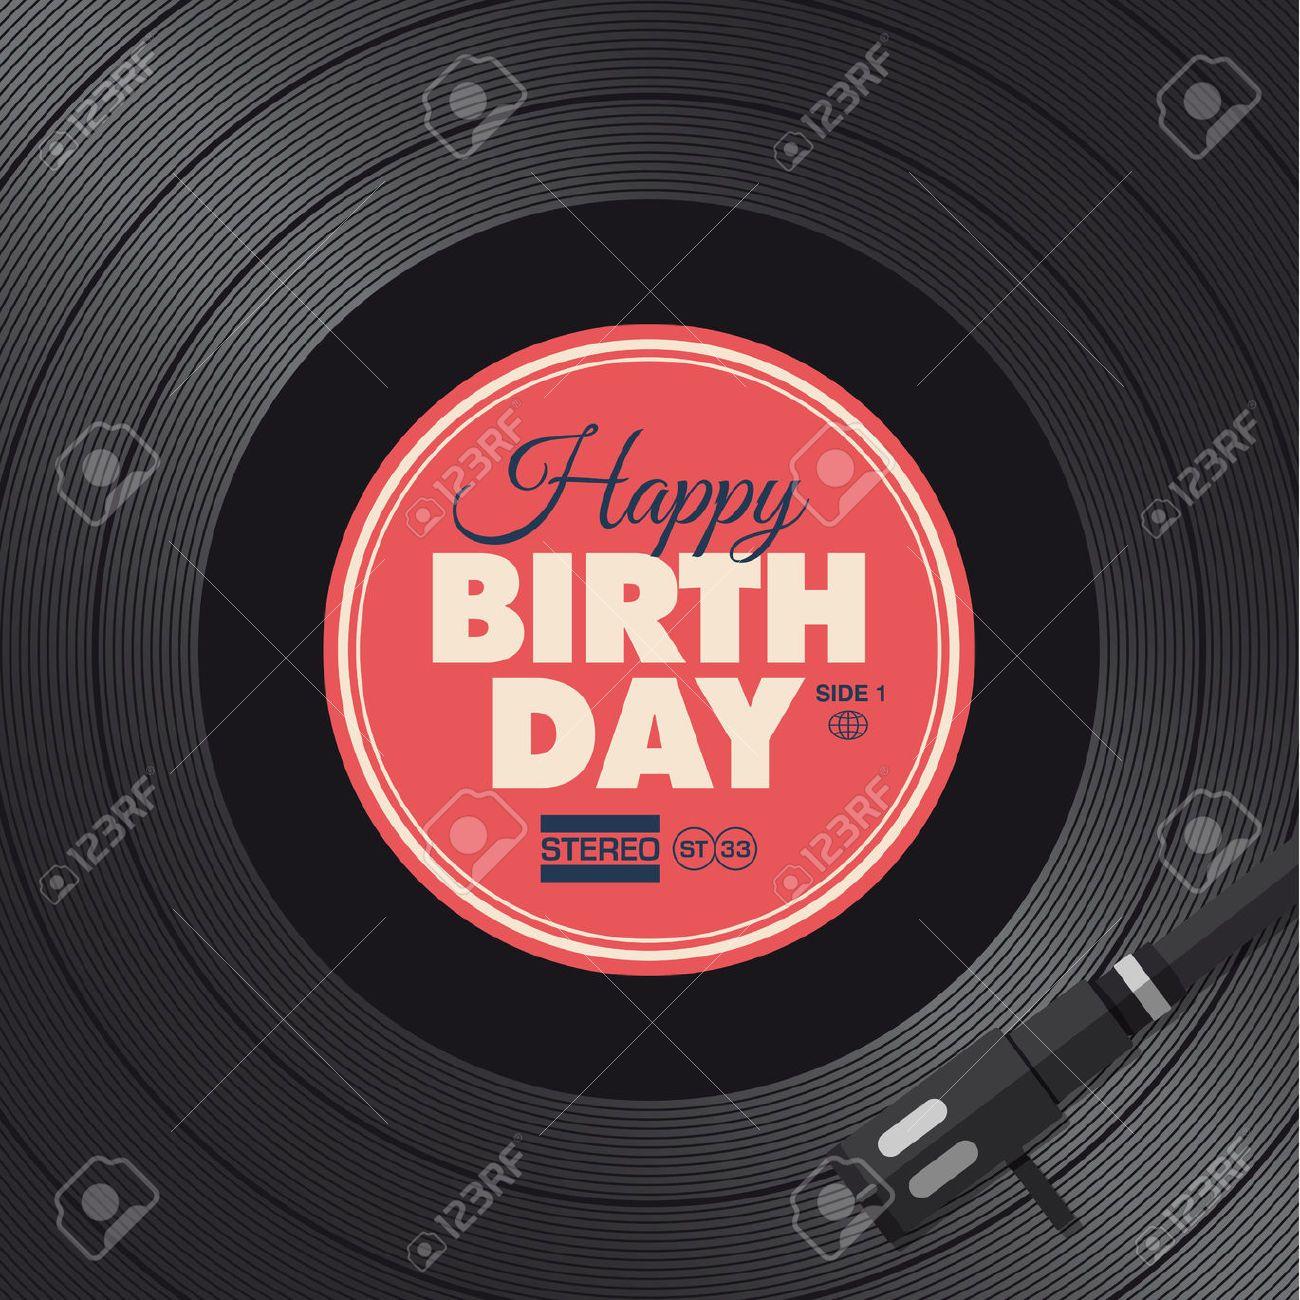 Happy birthday card vinyl illustration background vector design happy birthday card vinyl illustration background vector design kristyandbryce Choice Image